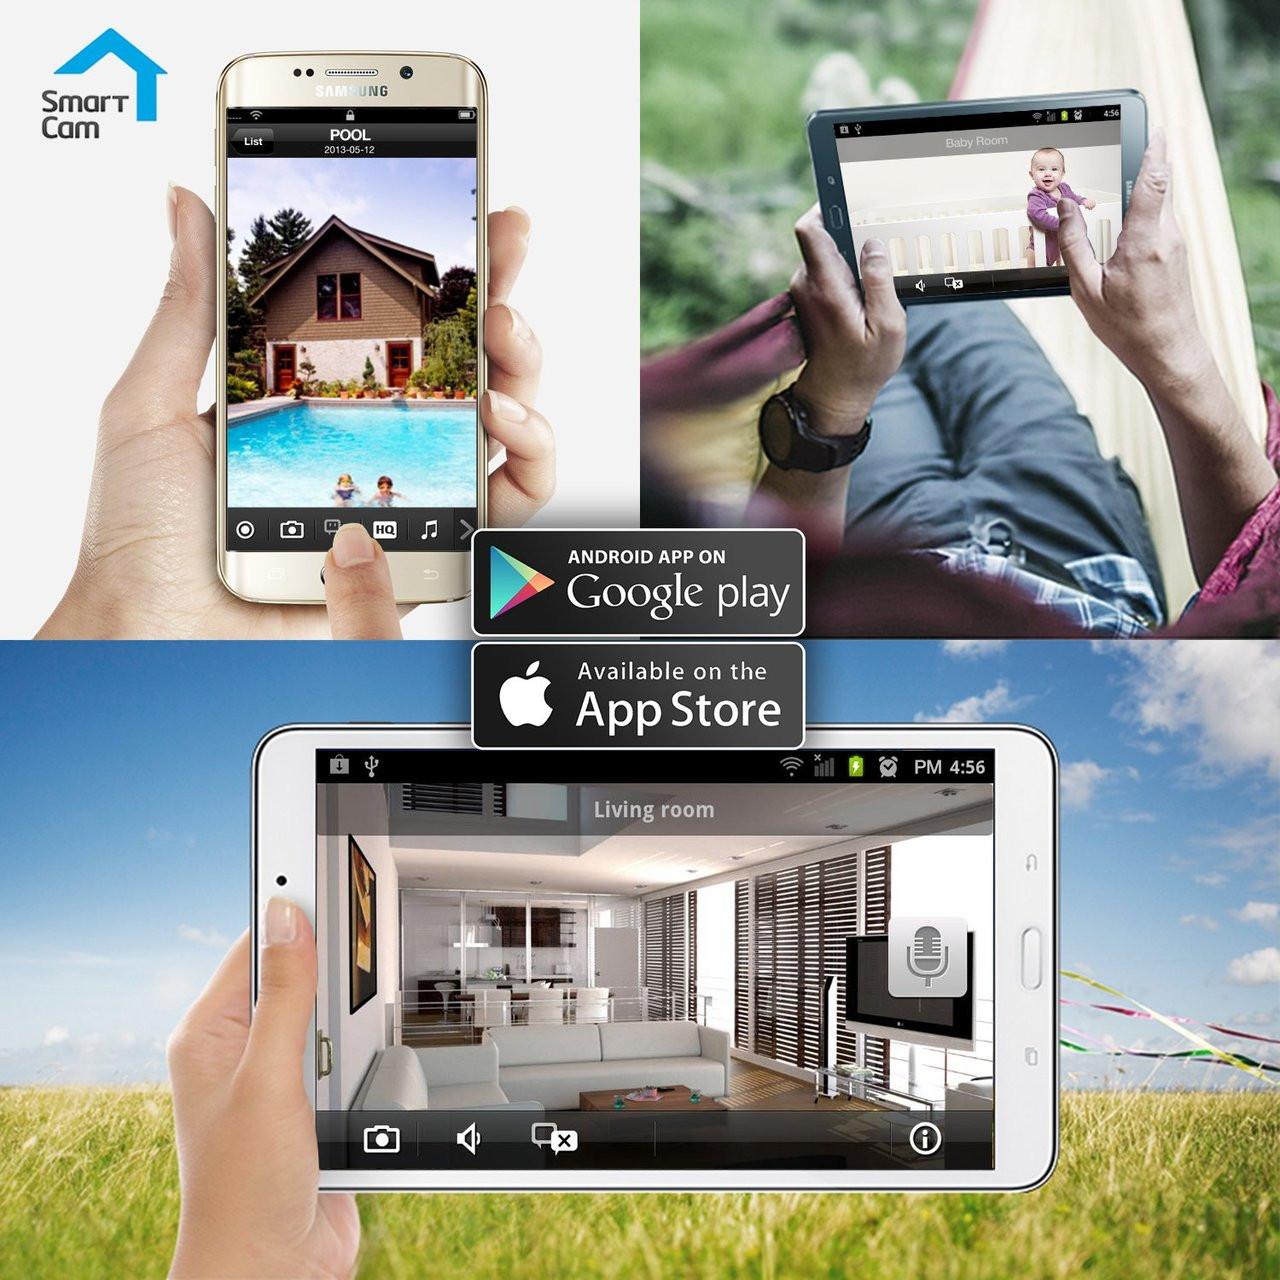 SmartCam 1080p Full HD WiFi Camera by Samsung - Security Camera